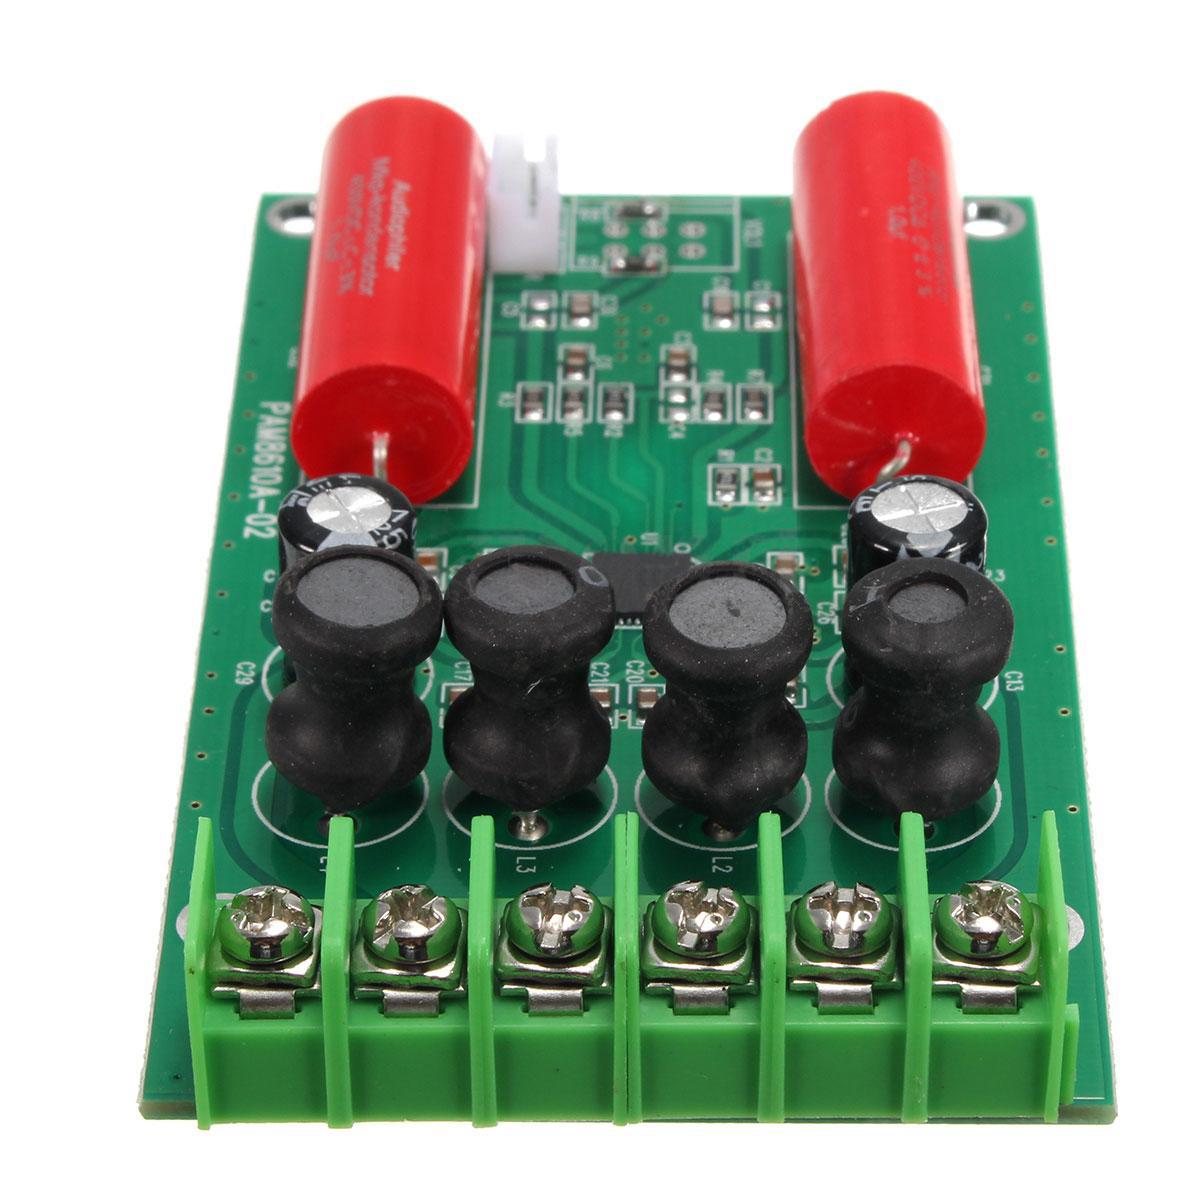 Ta2024 Tested Pcb Power Digital Audio Amplifier Board Module 12v Electric Unit Circuit 2x15w Mini V1g9